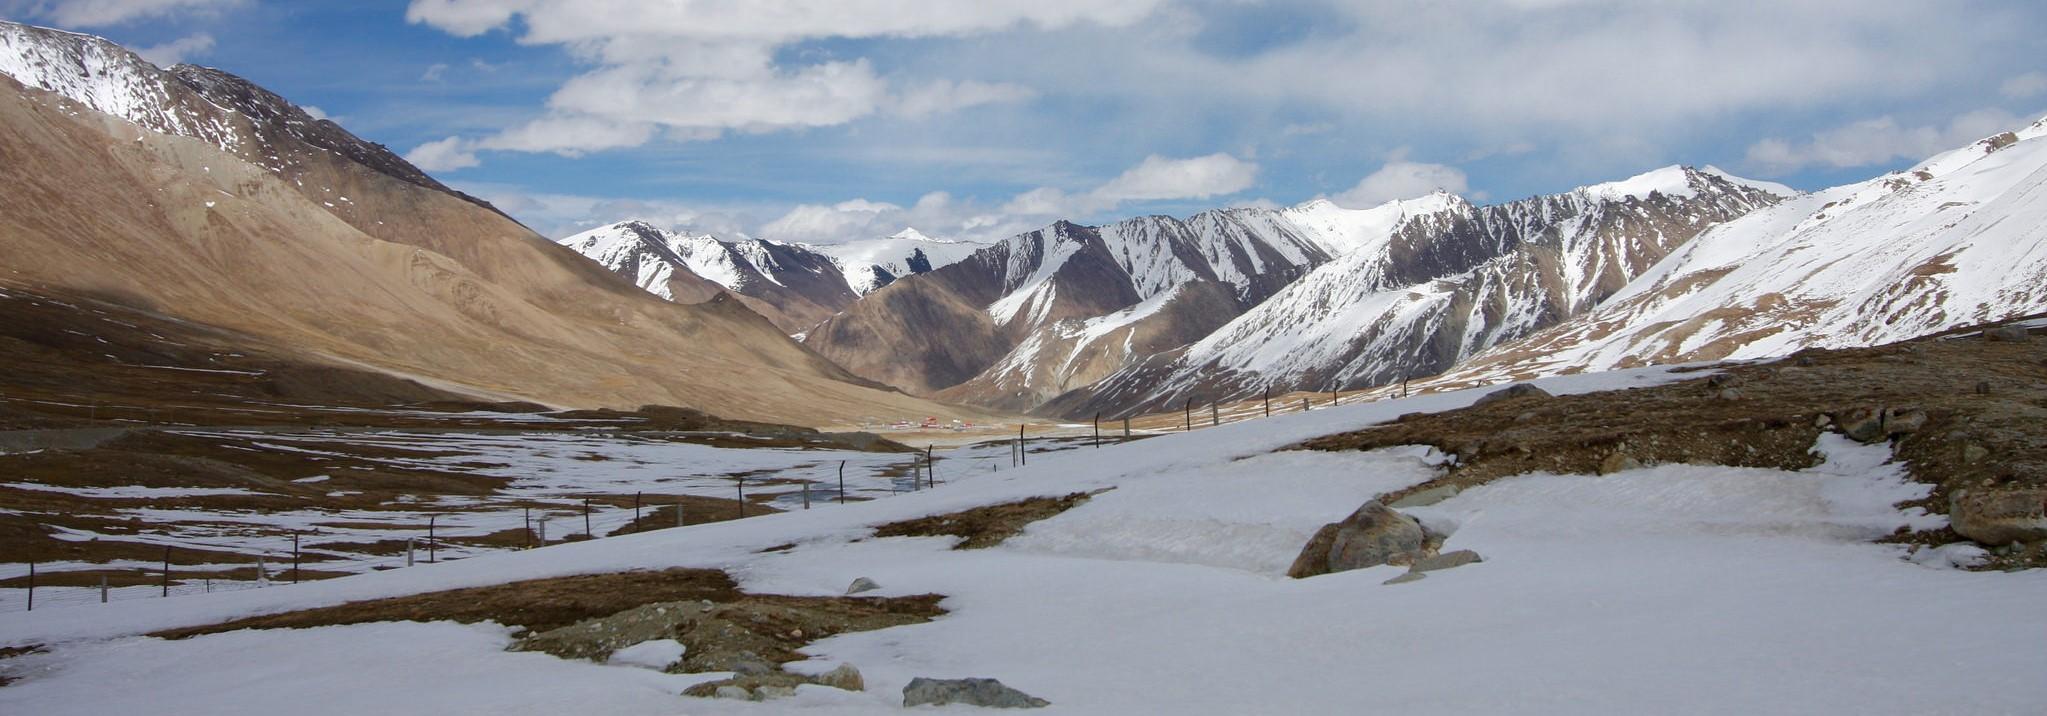 Near Khunjerab Pass, on the China-Pakistan border, 2016 (Photo: Johannes Zielcke/Flickr)